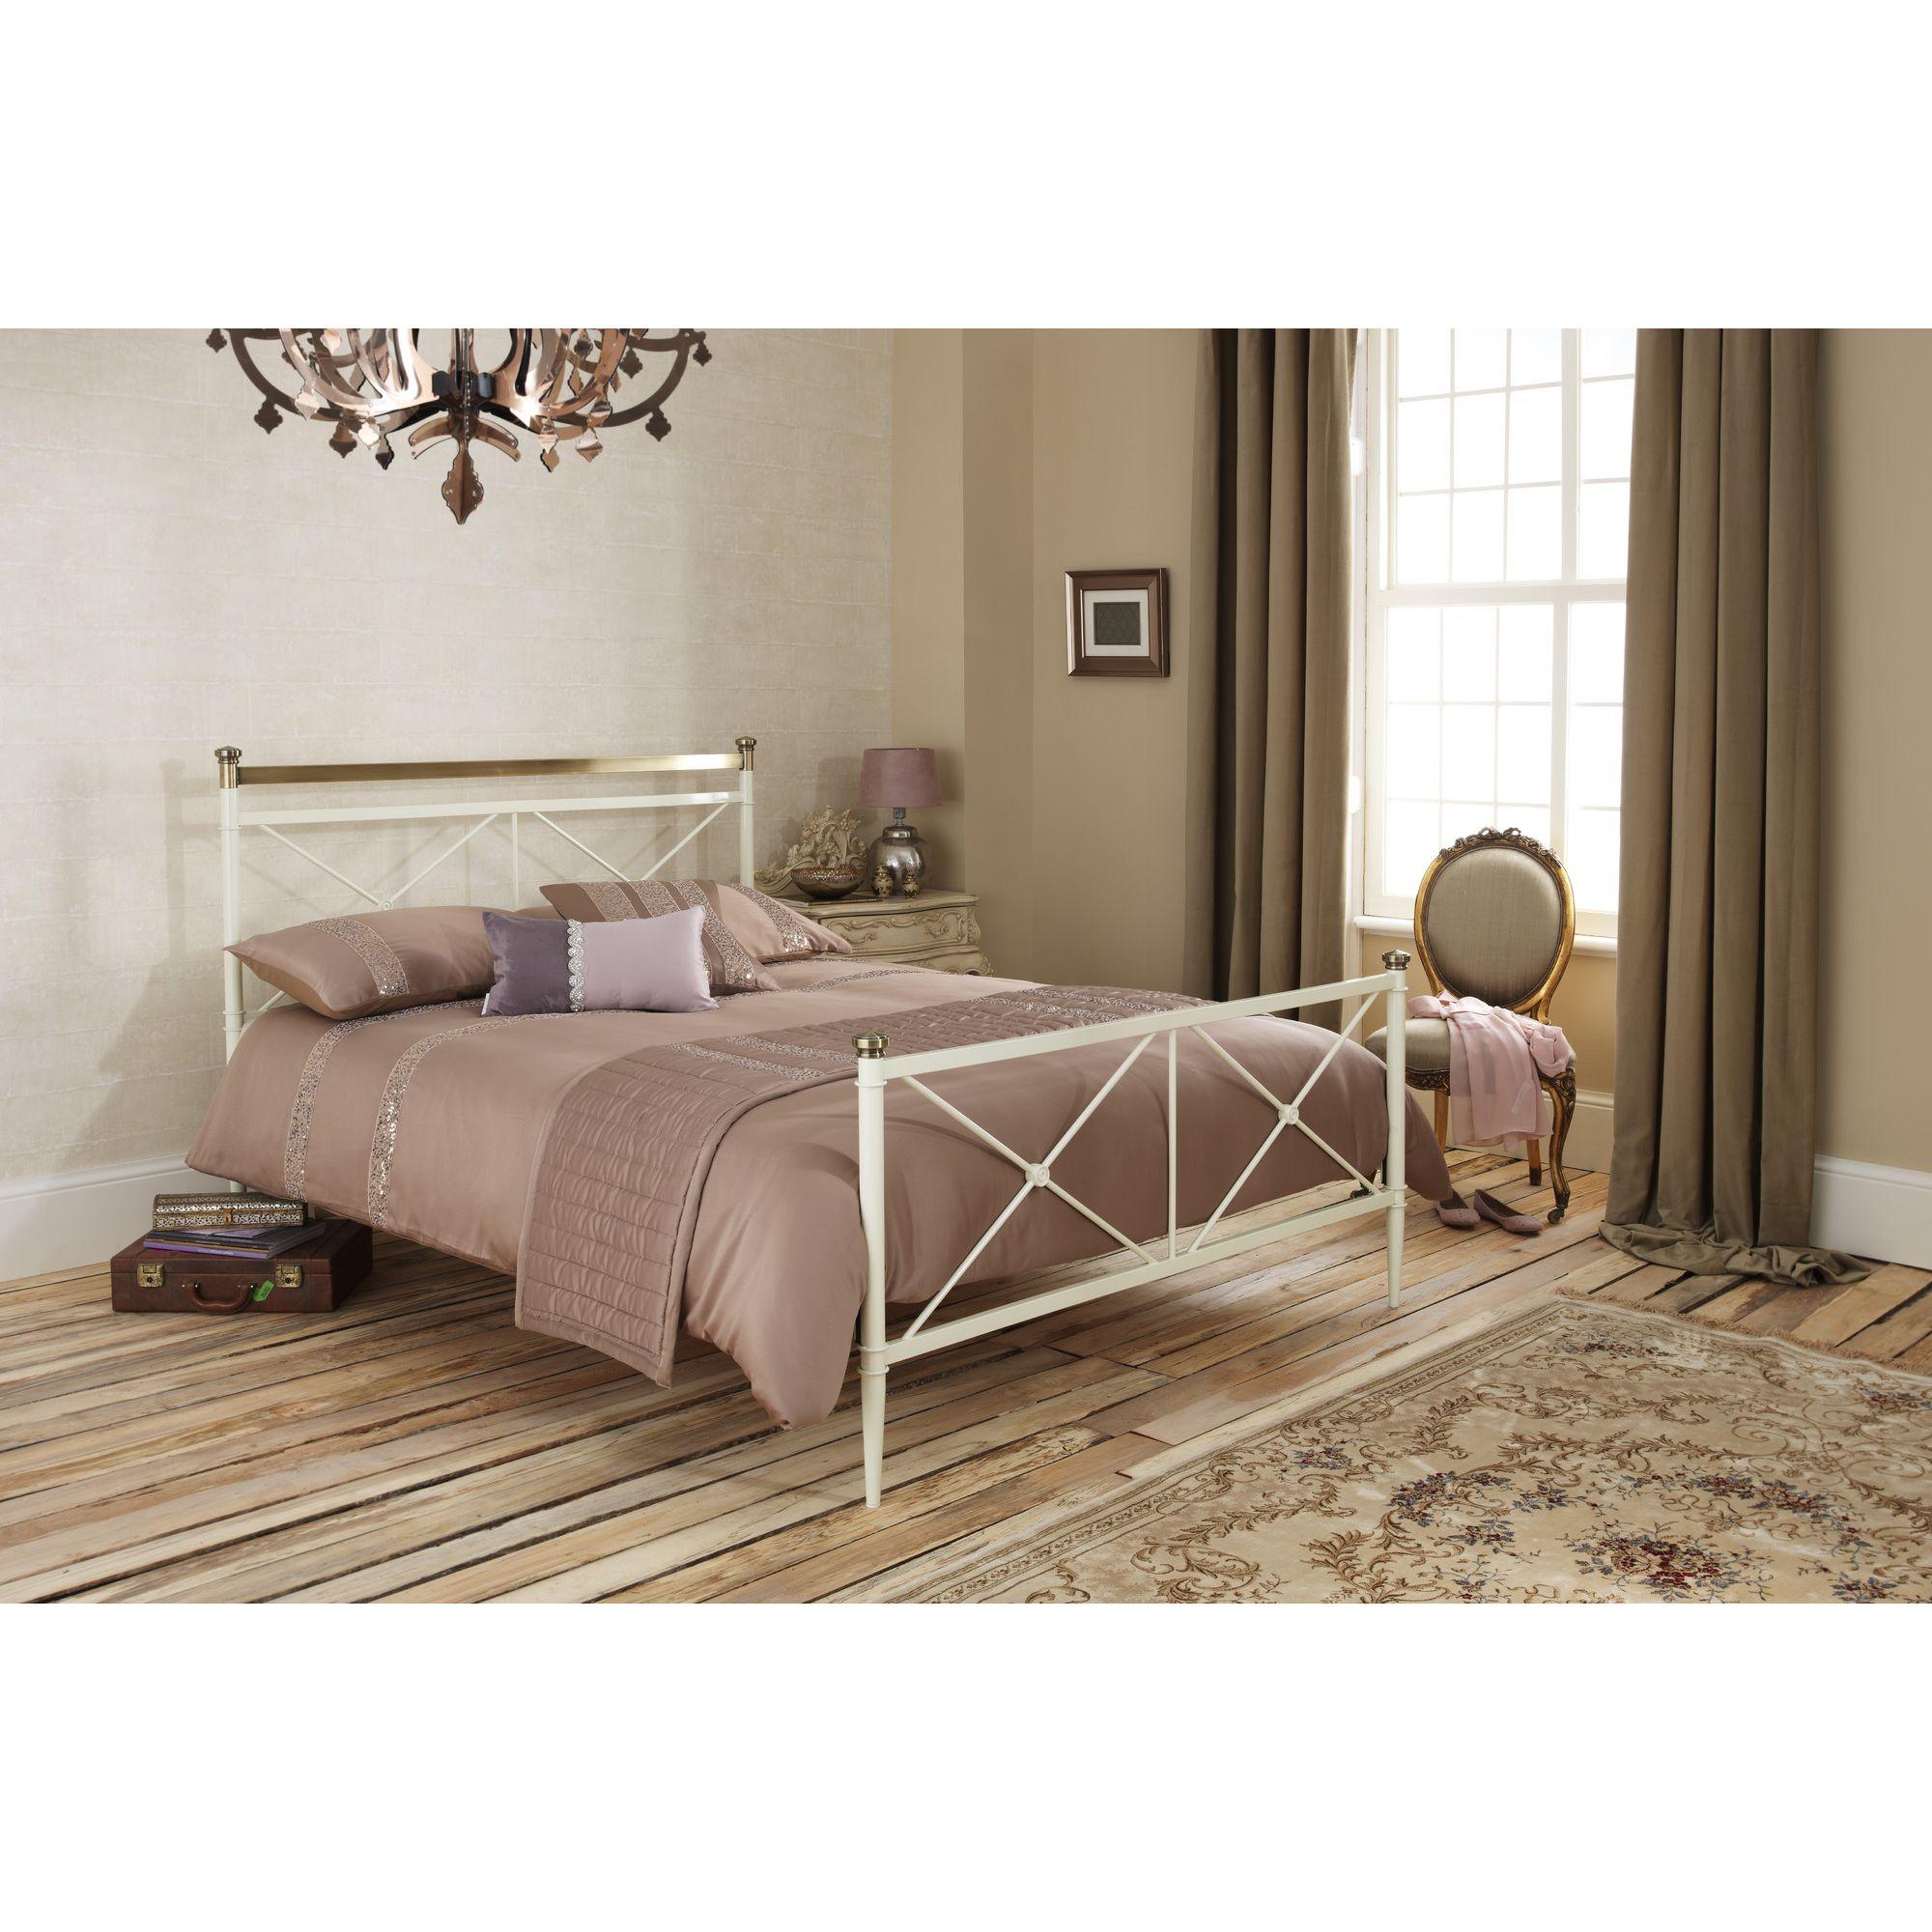 Serene Furnishings Pasha Bed Frame - King at Tesco Direct